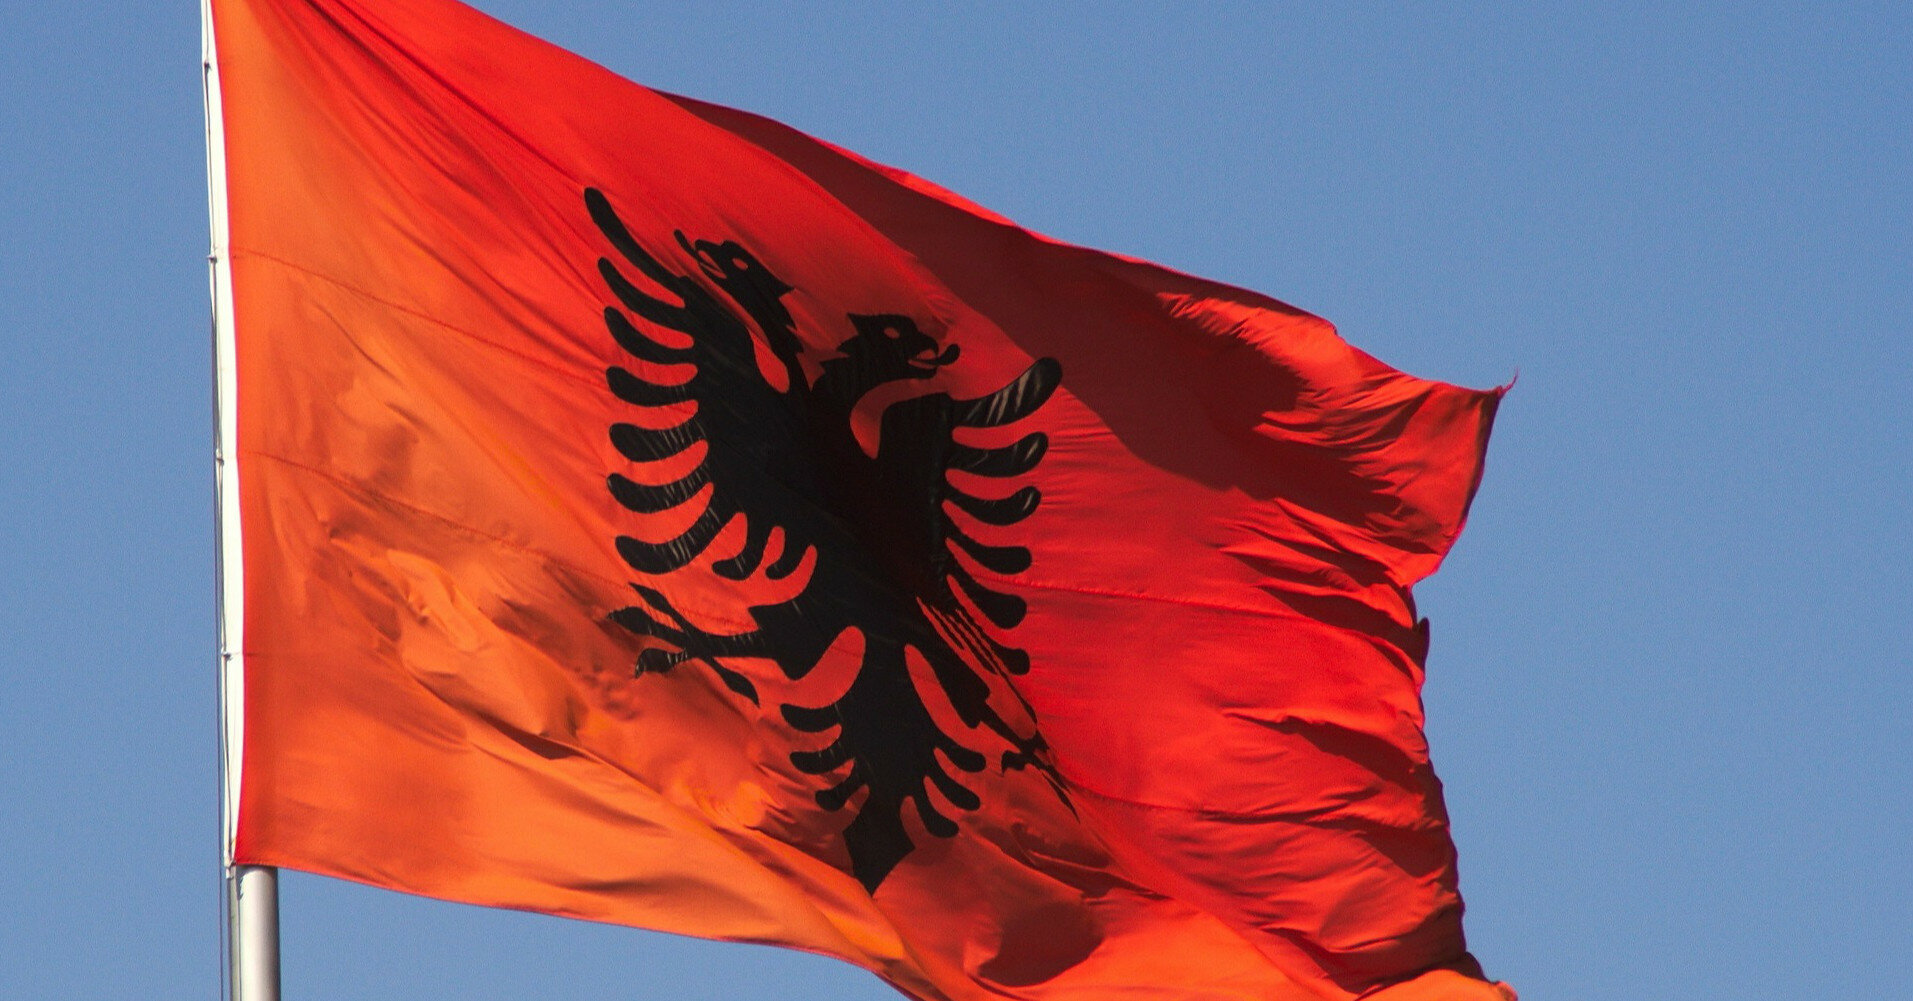 Албанскому президенту объявили импичмент